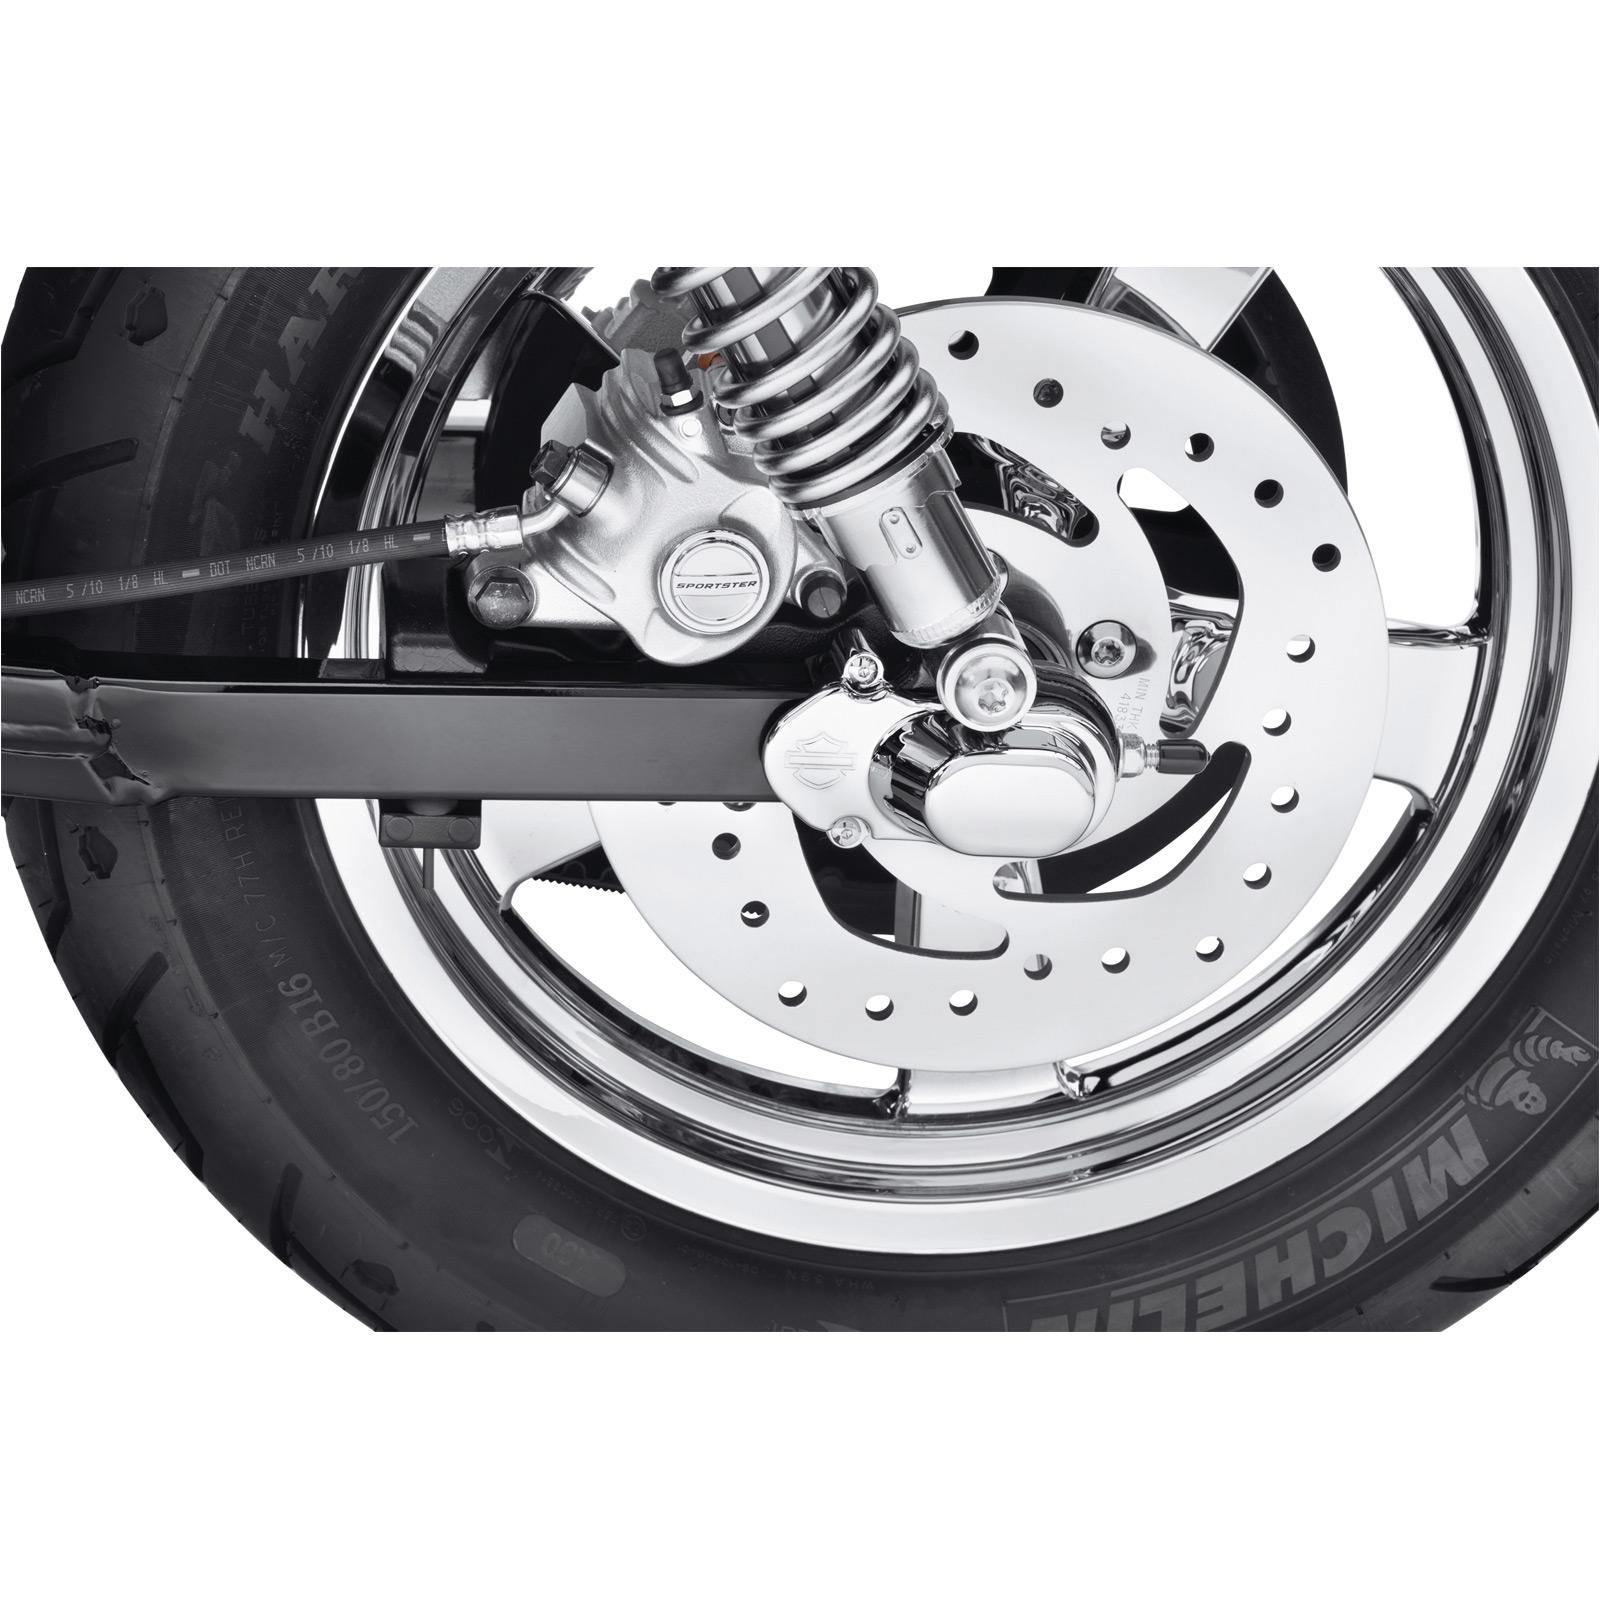 Harley Davidson Rear Axle Cover Kit Chromed Bar Amp Shield